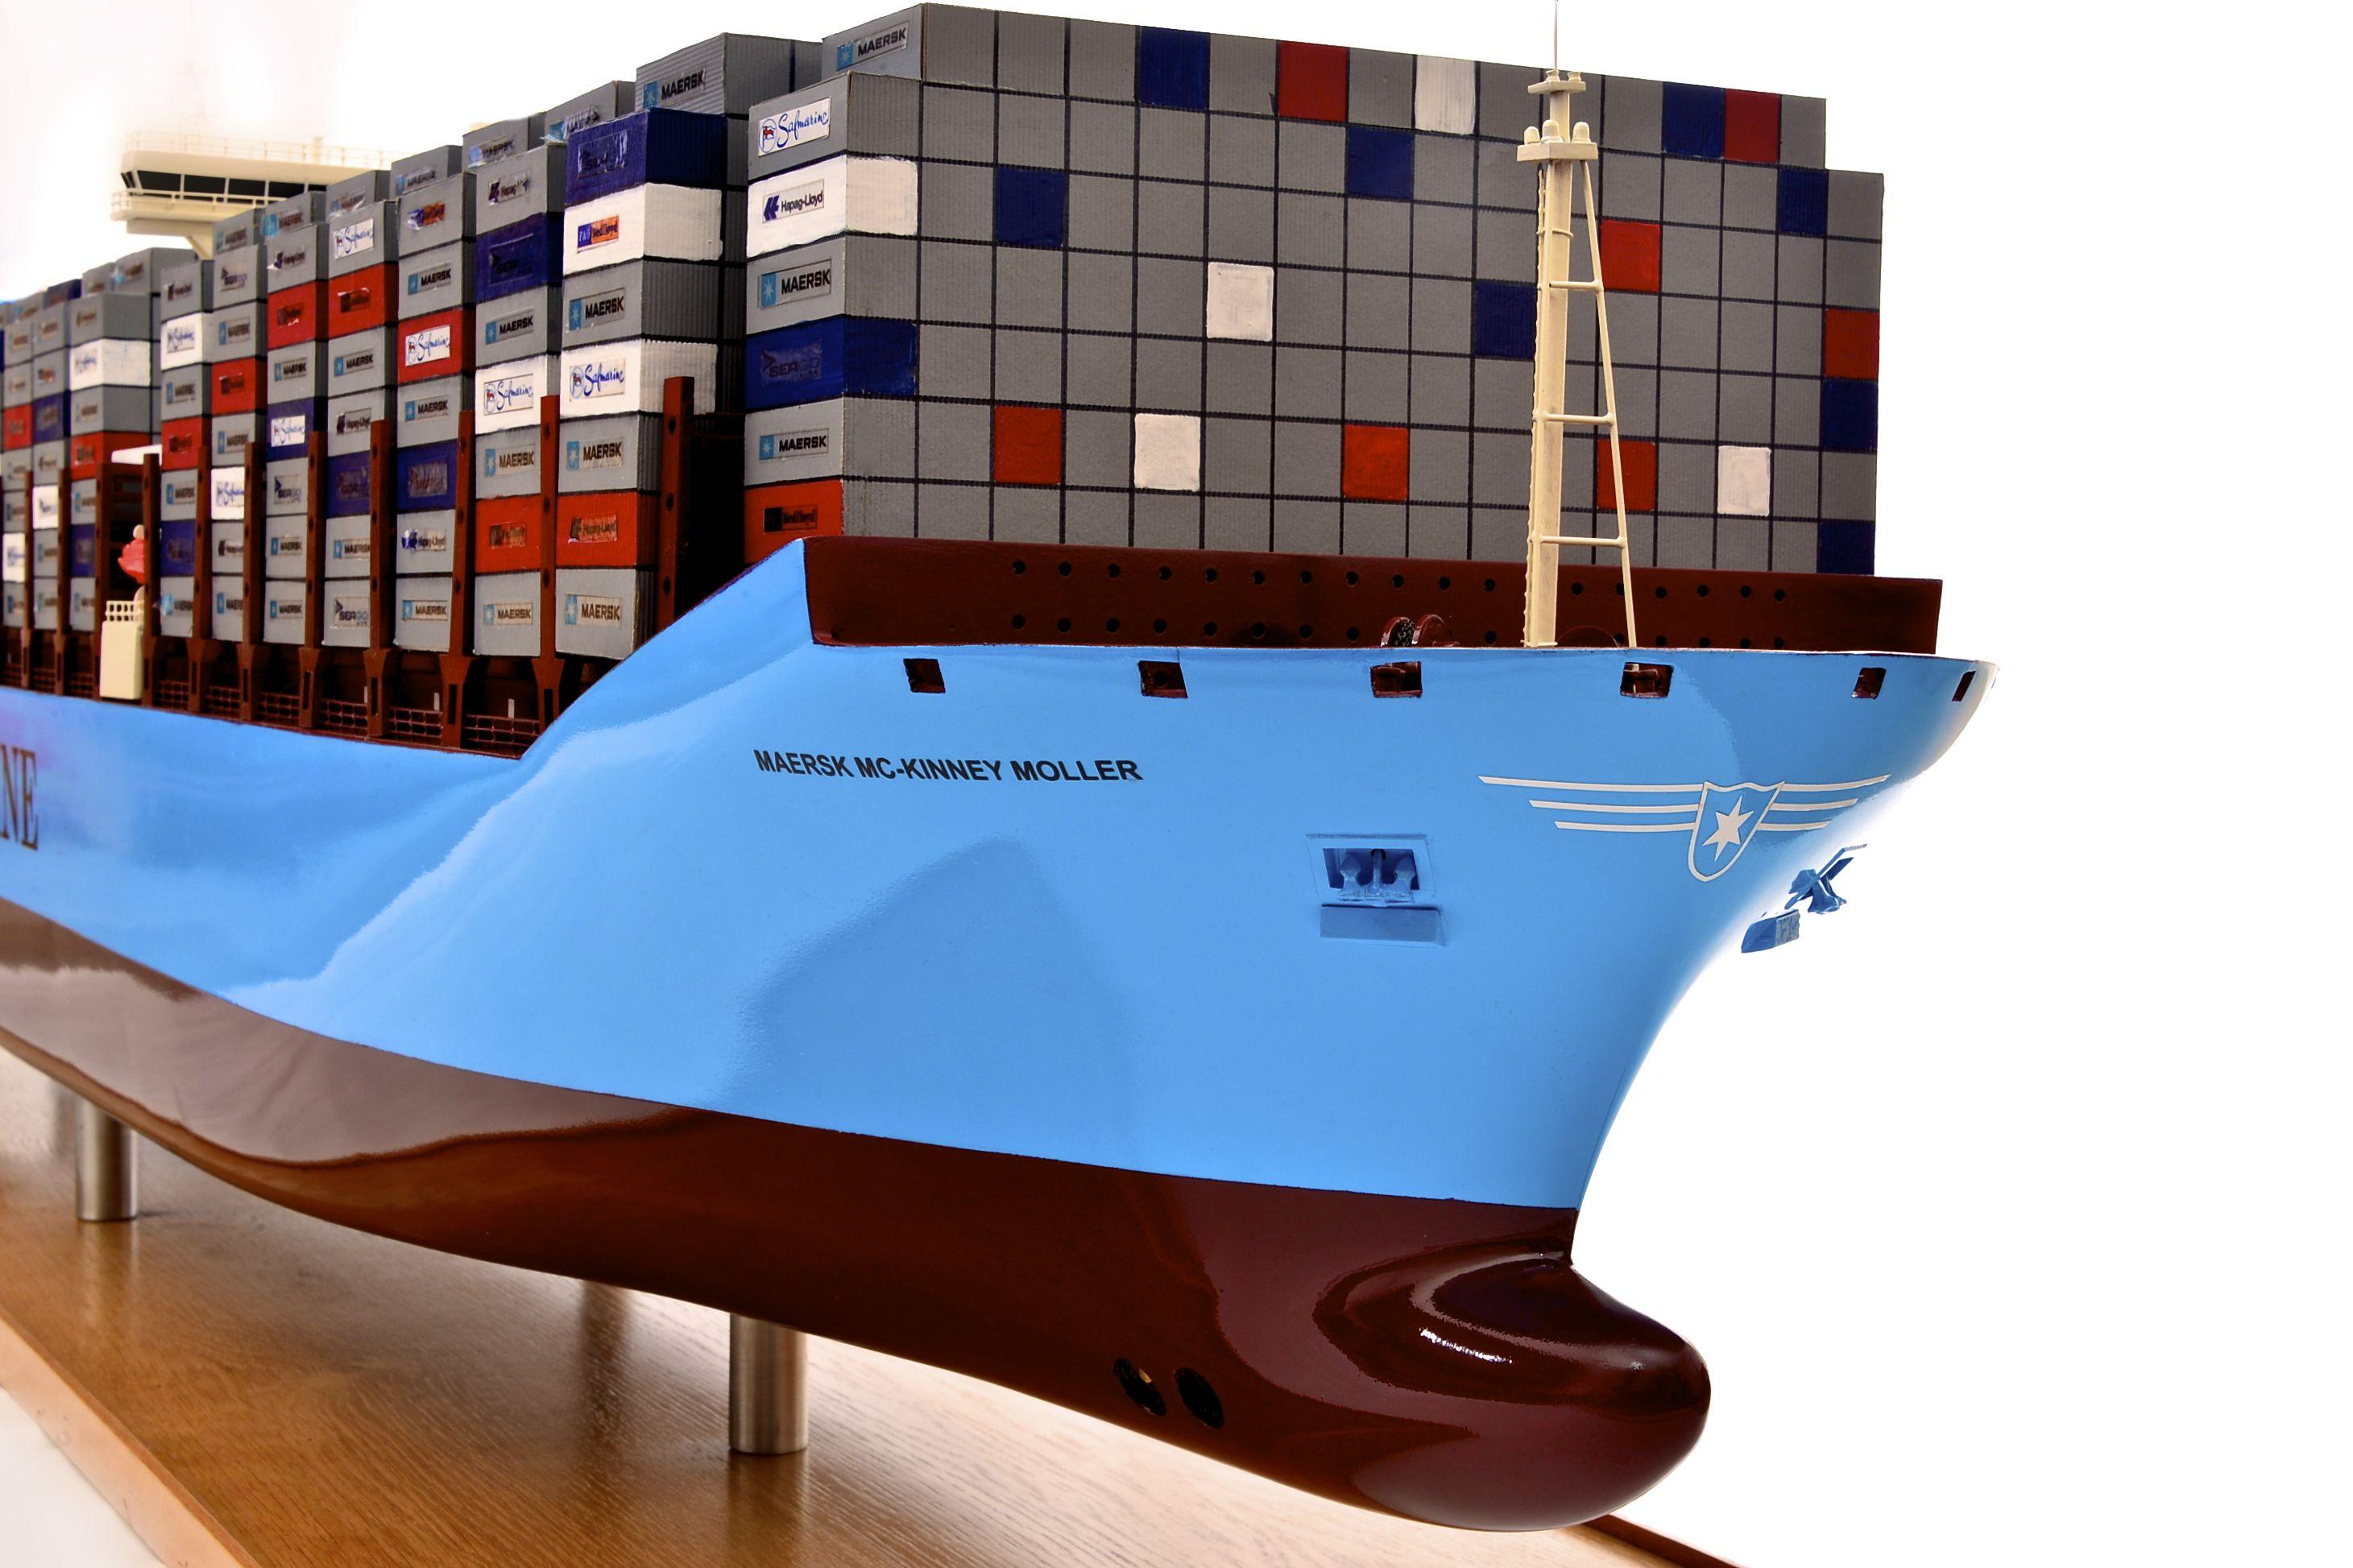 1812-10714-Emma-Maersk-Model-Ship